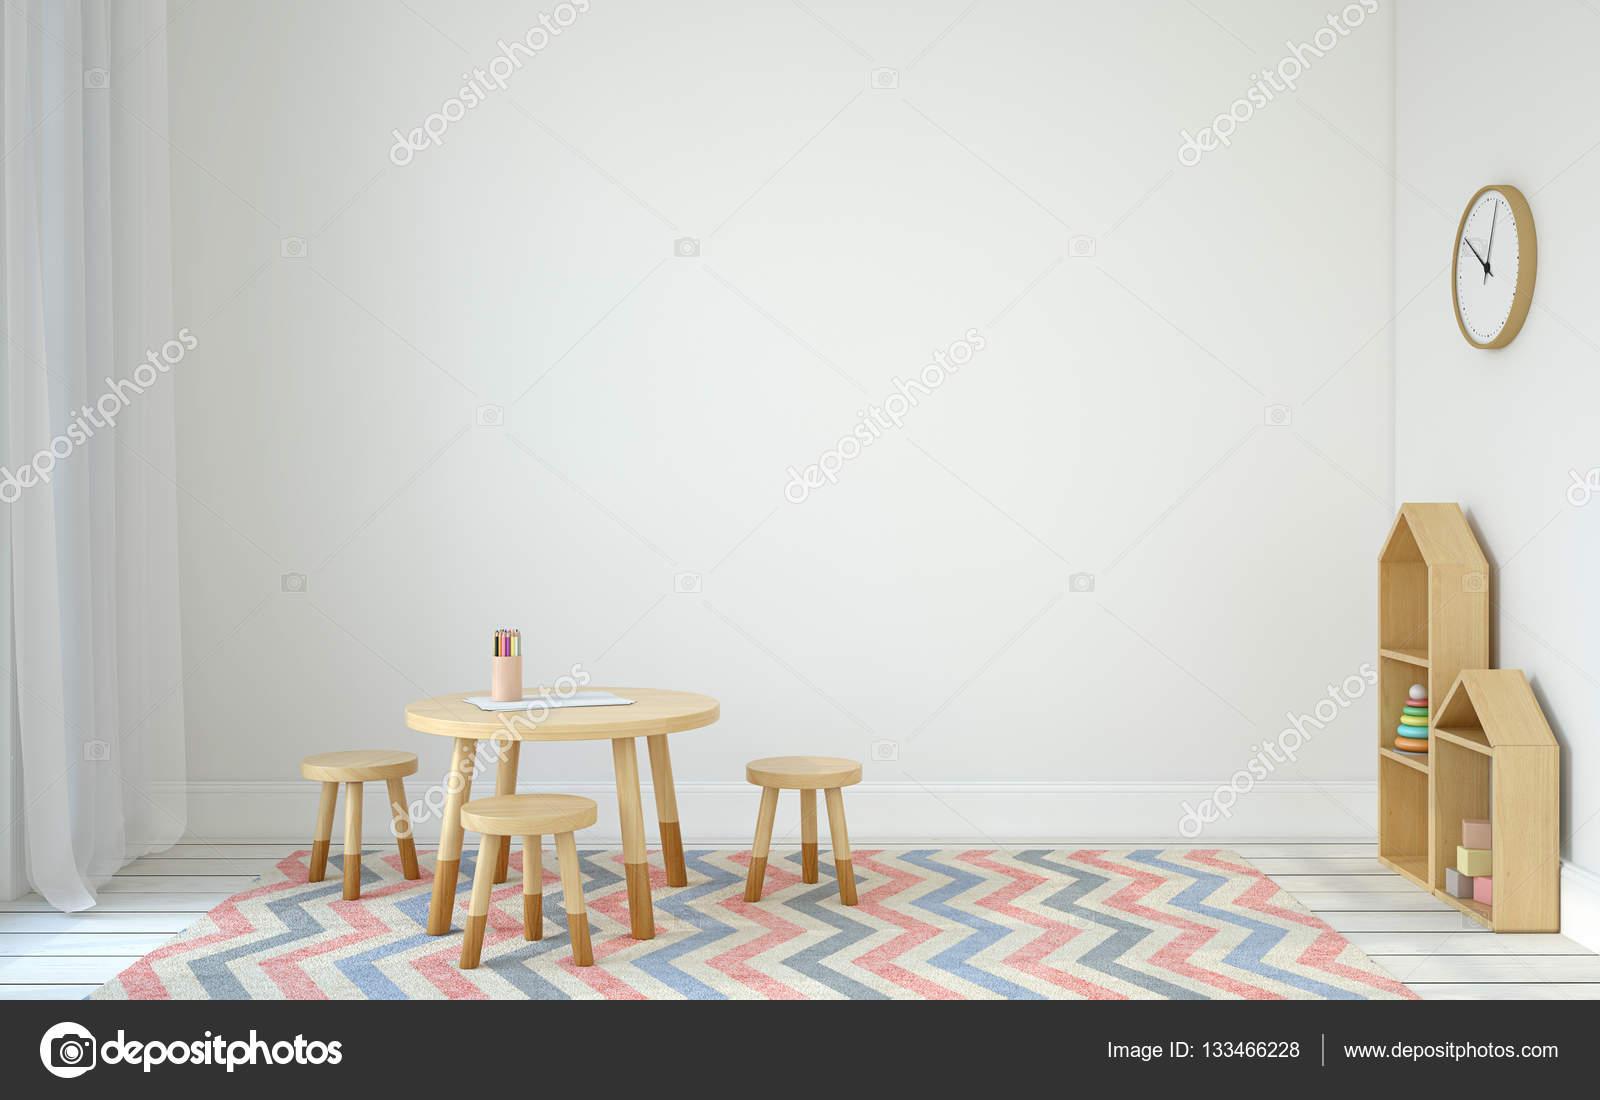 Interno della sala giochi. 3d render u2014 foto stock © poligonchik